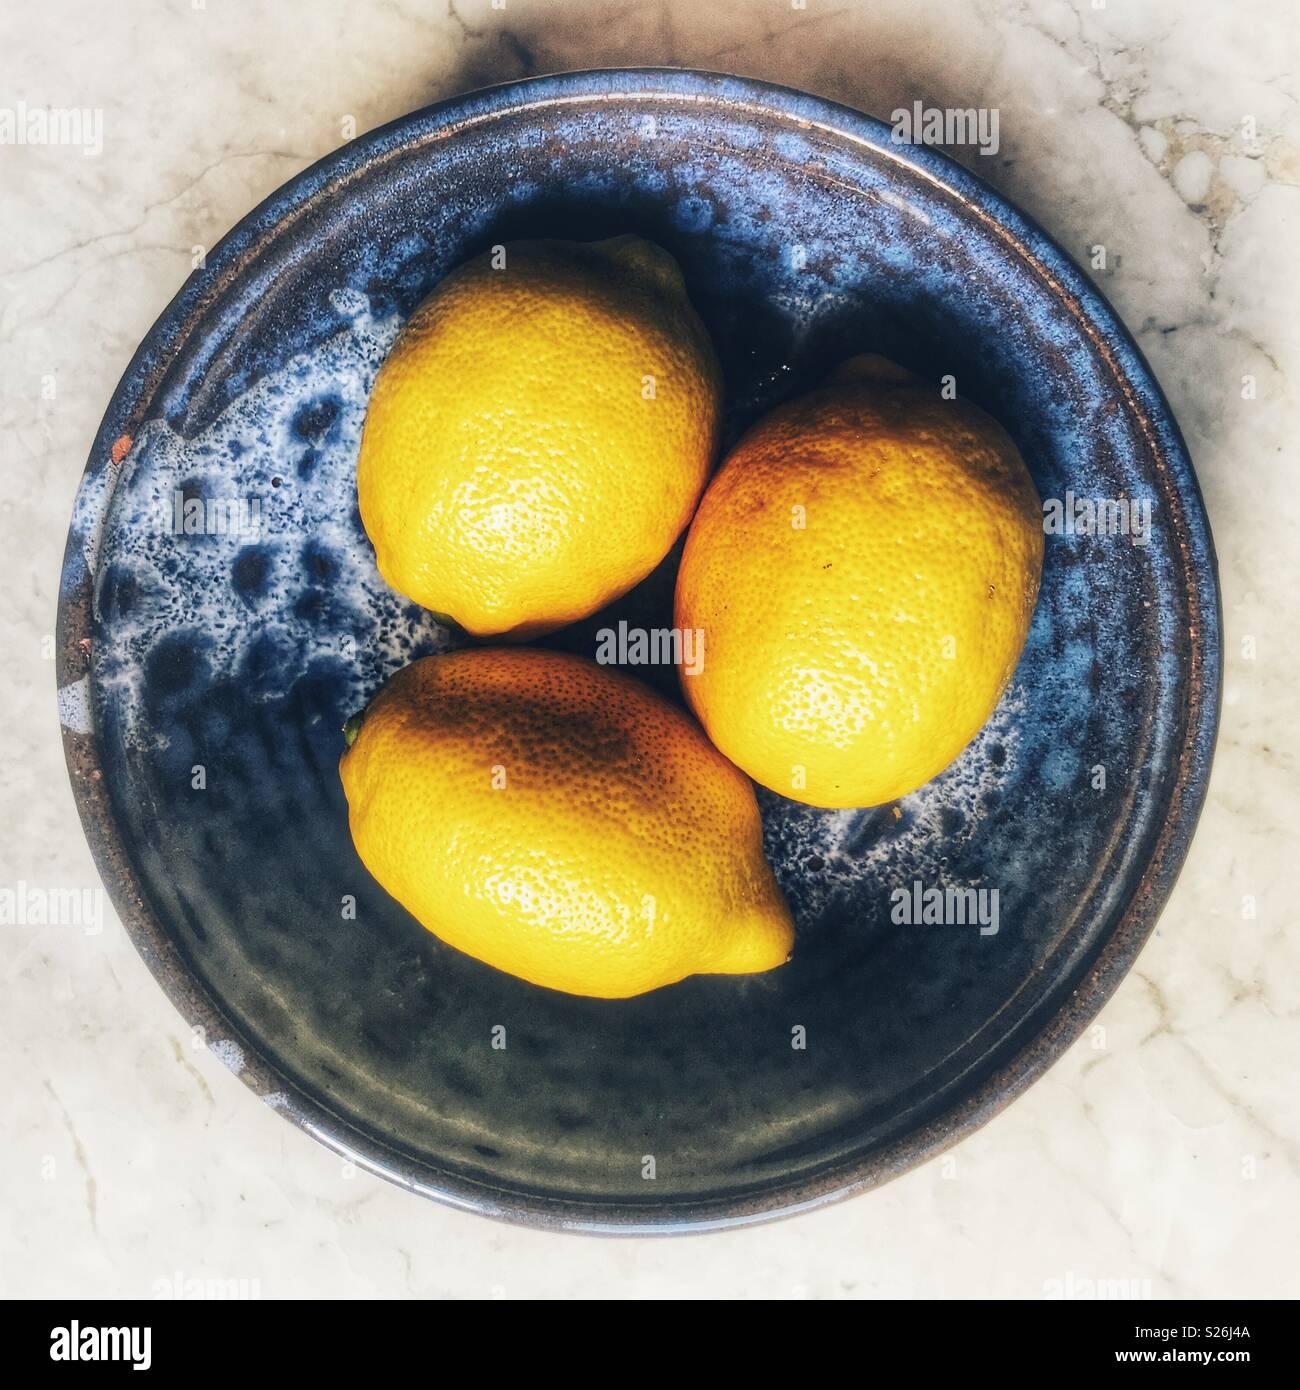 Three fresh lemons in a blue ceramic bowl - Stock Image